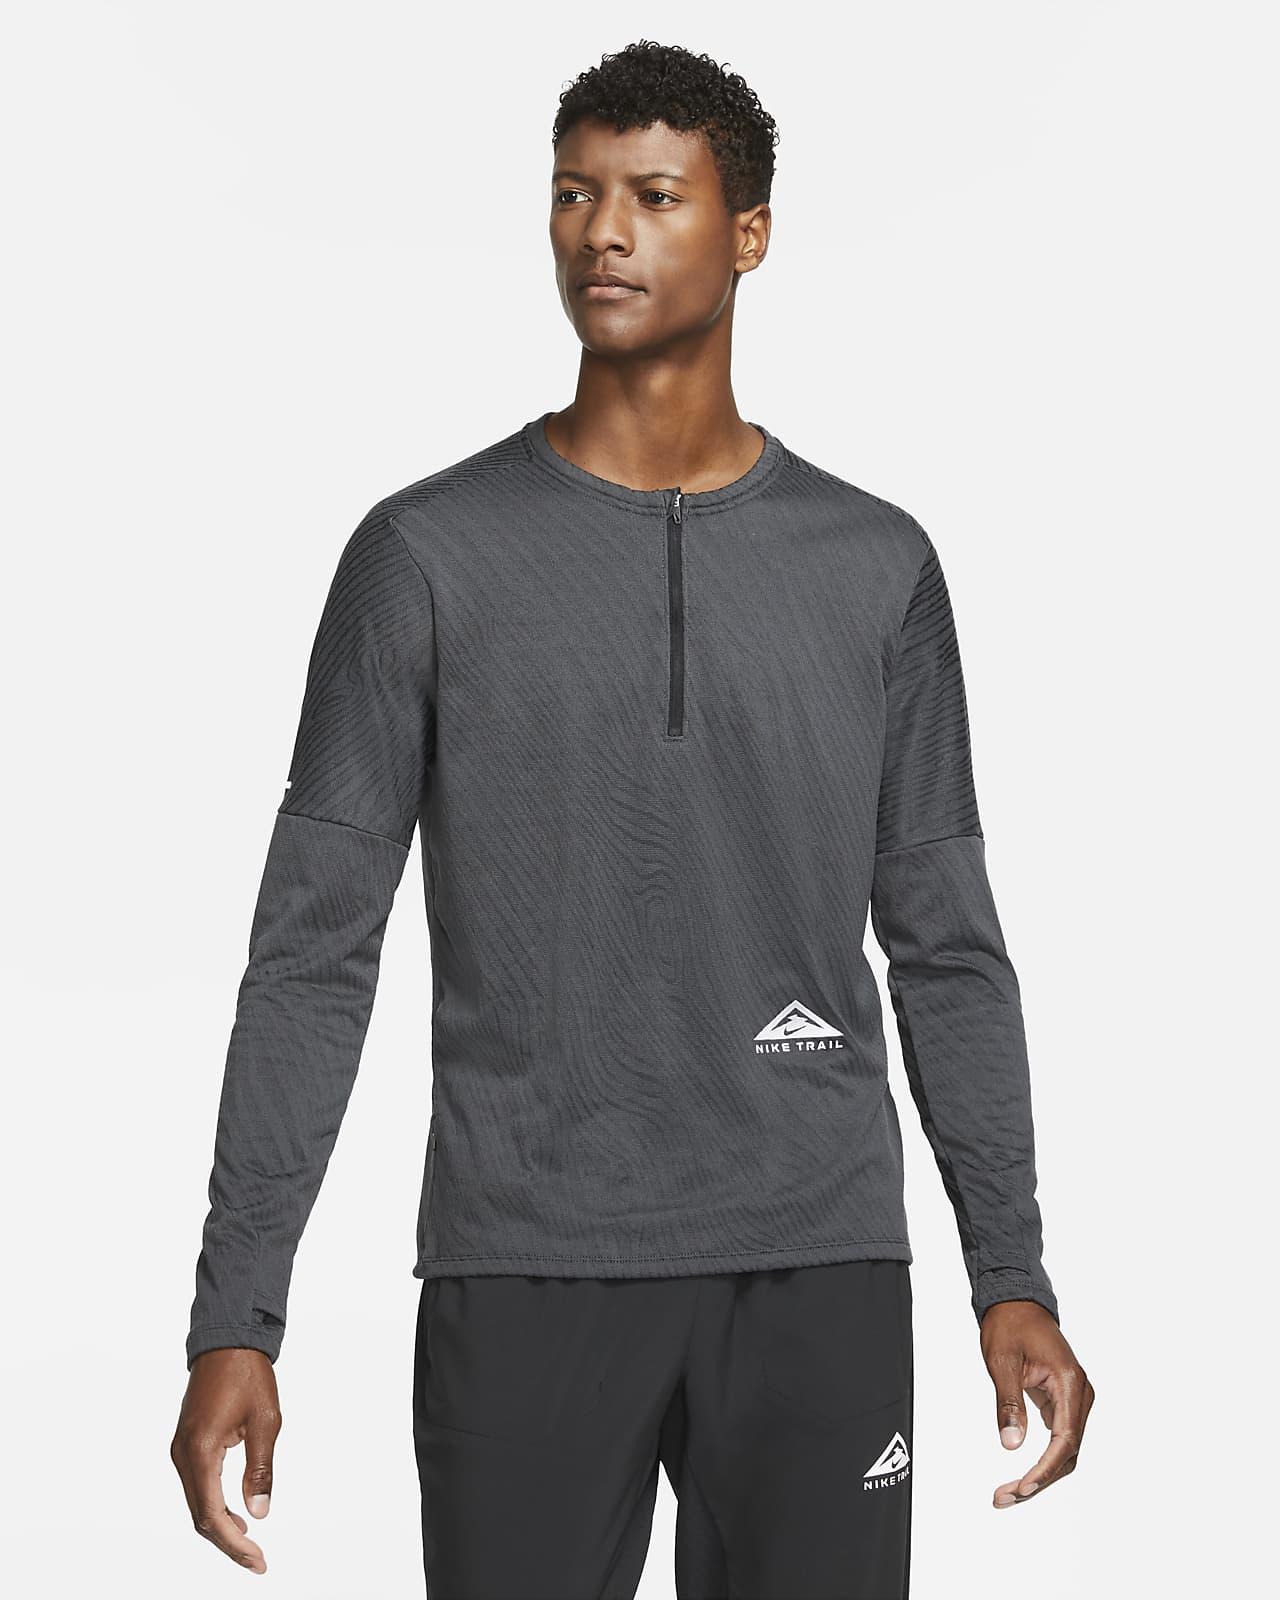 Nike Dri-FIT Men's 1/2-Zip Trail Running Top